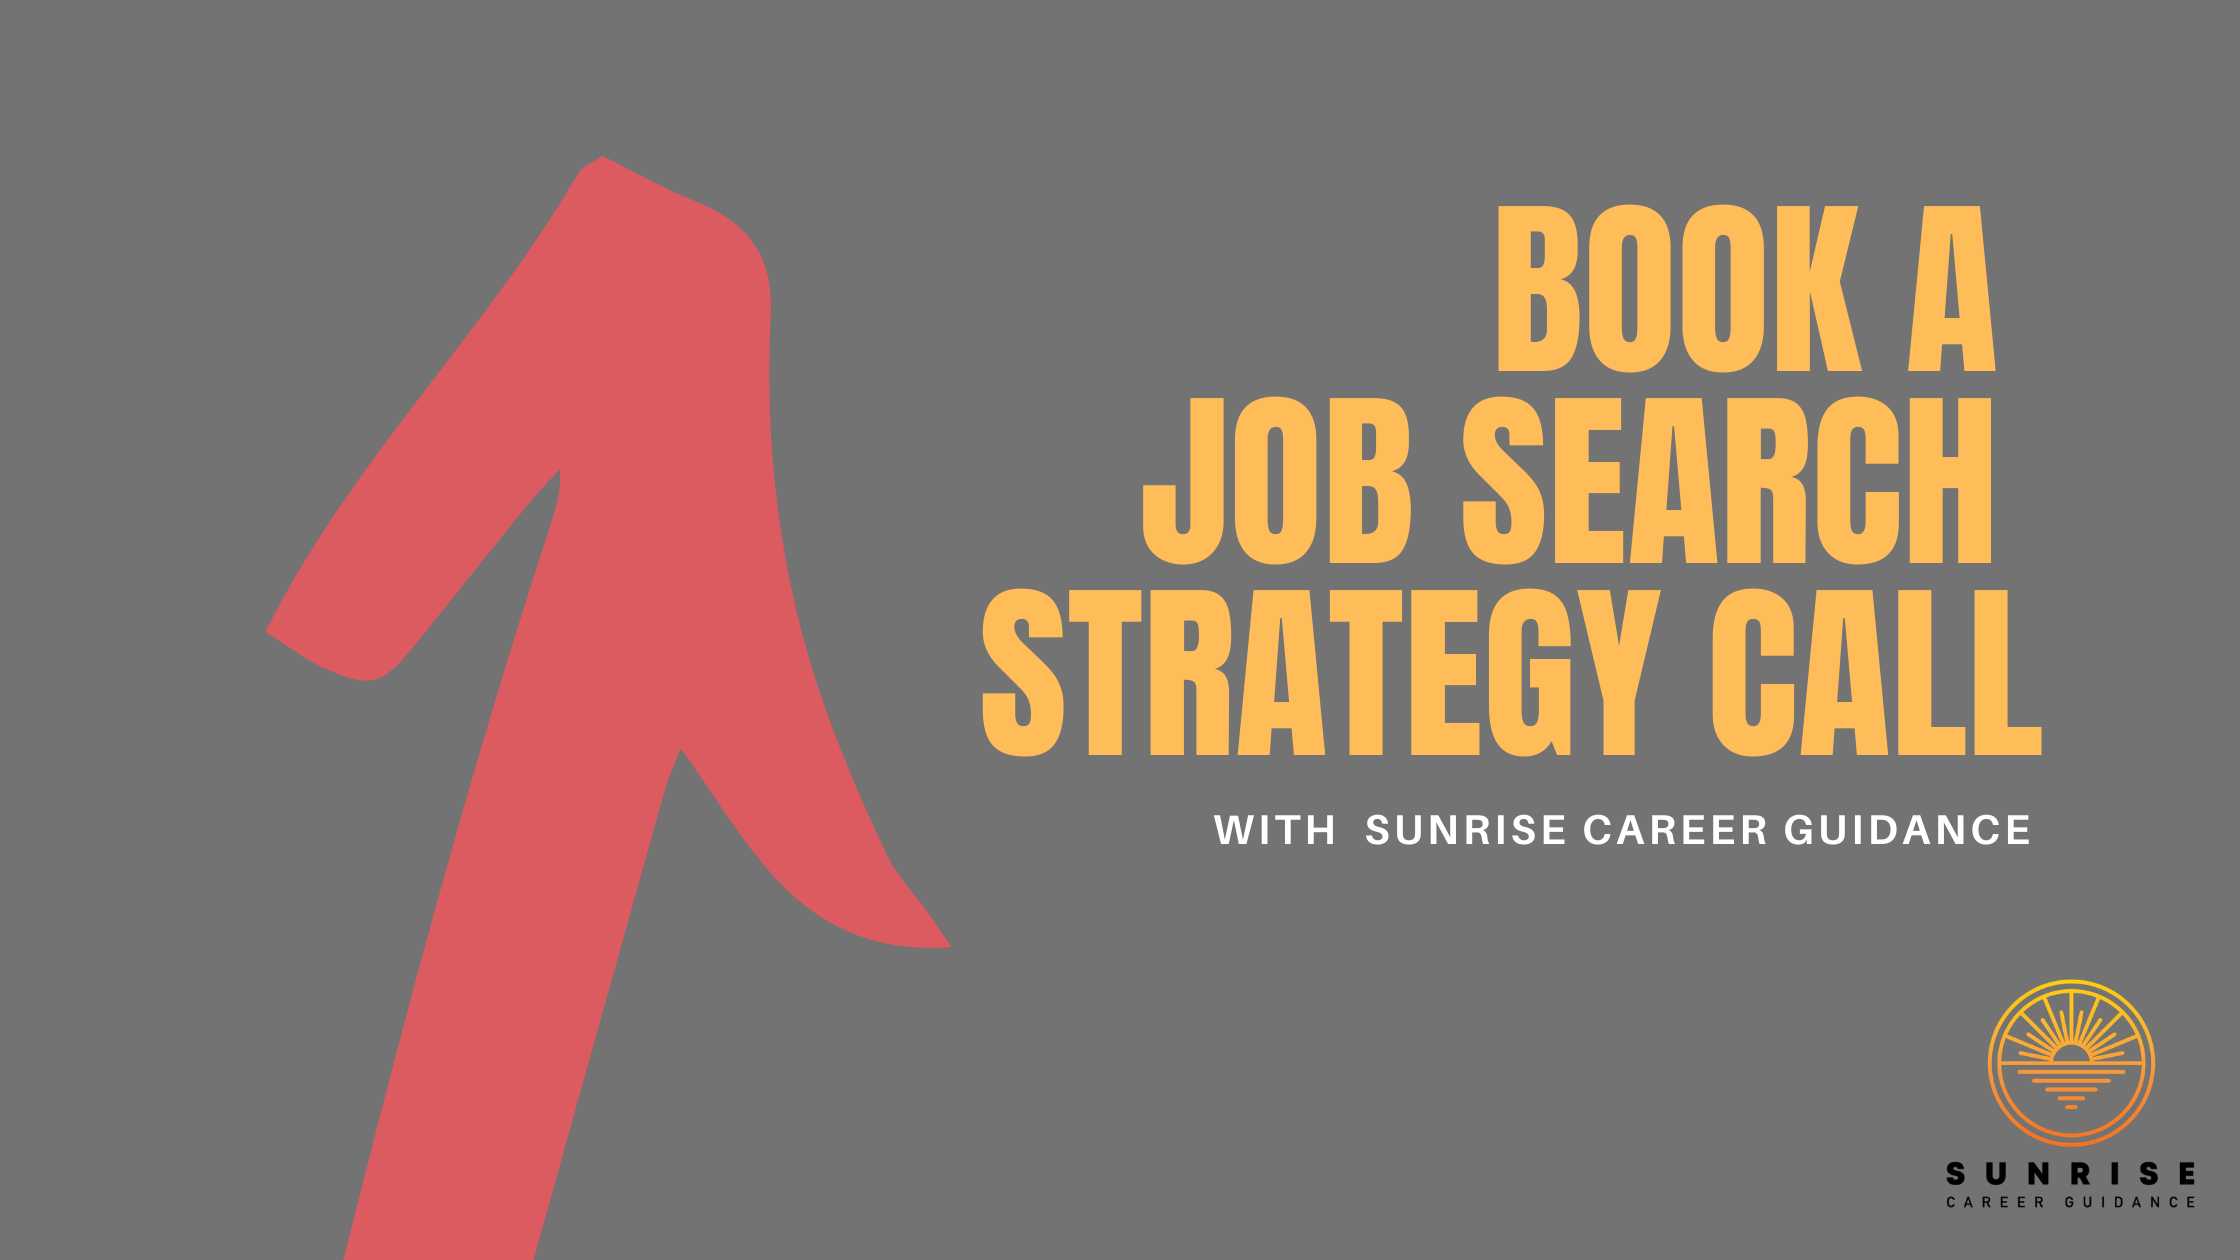 job-search-strategy-call-sunrise-career-guidance